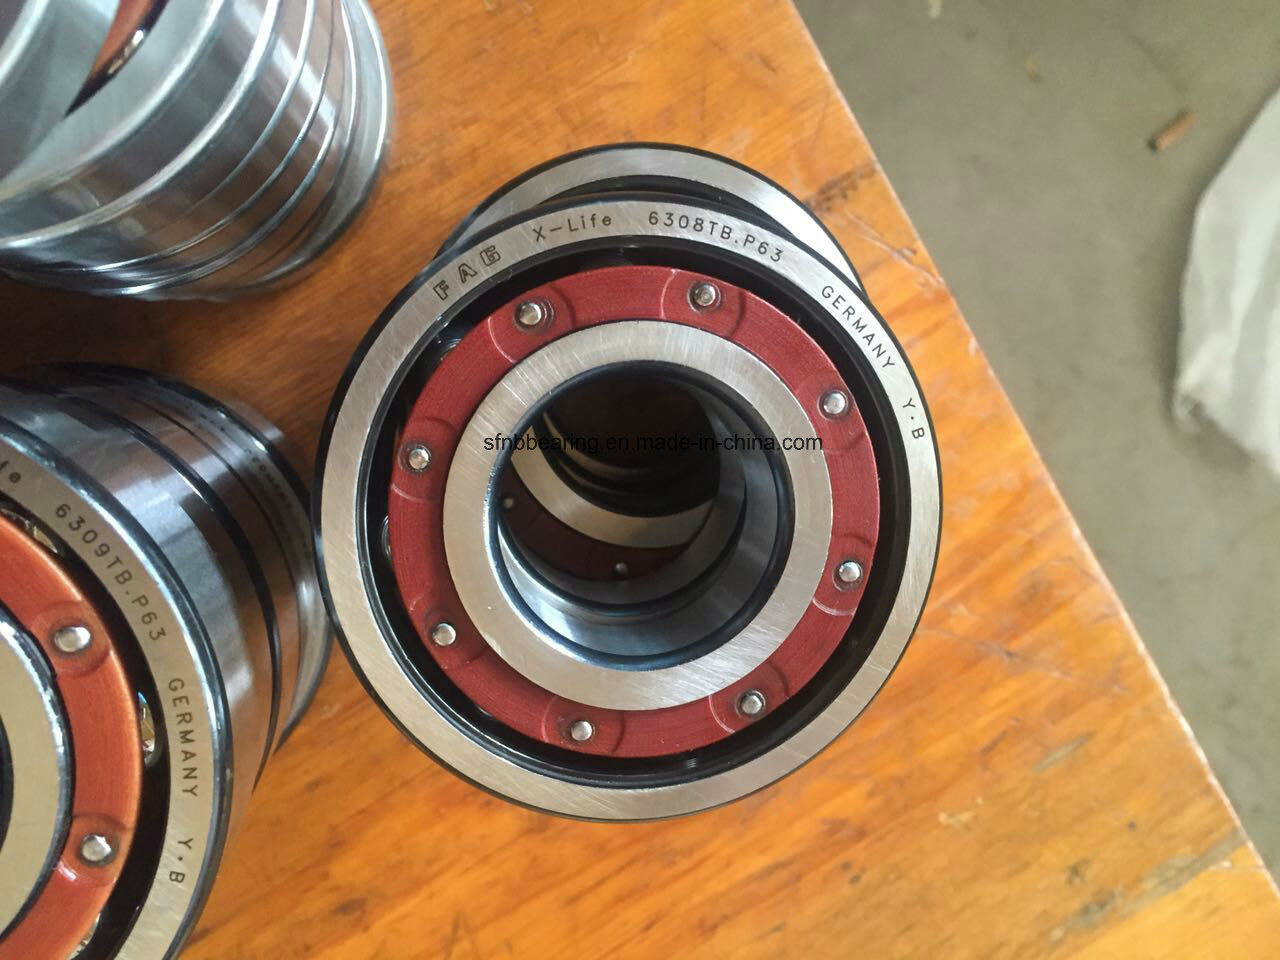 hight resolution of bearing manufacturer 6205 tbp63 gear box bearing used on racing motorcycle